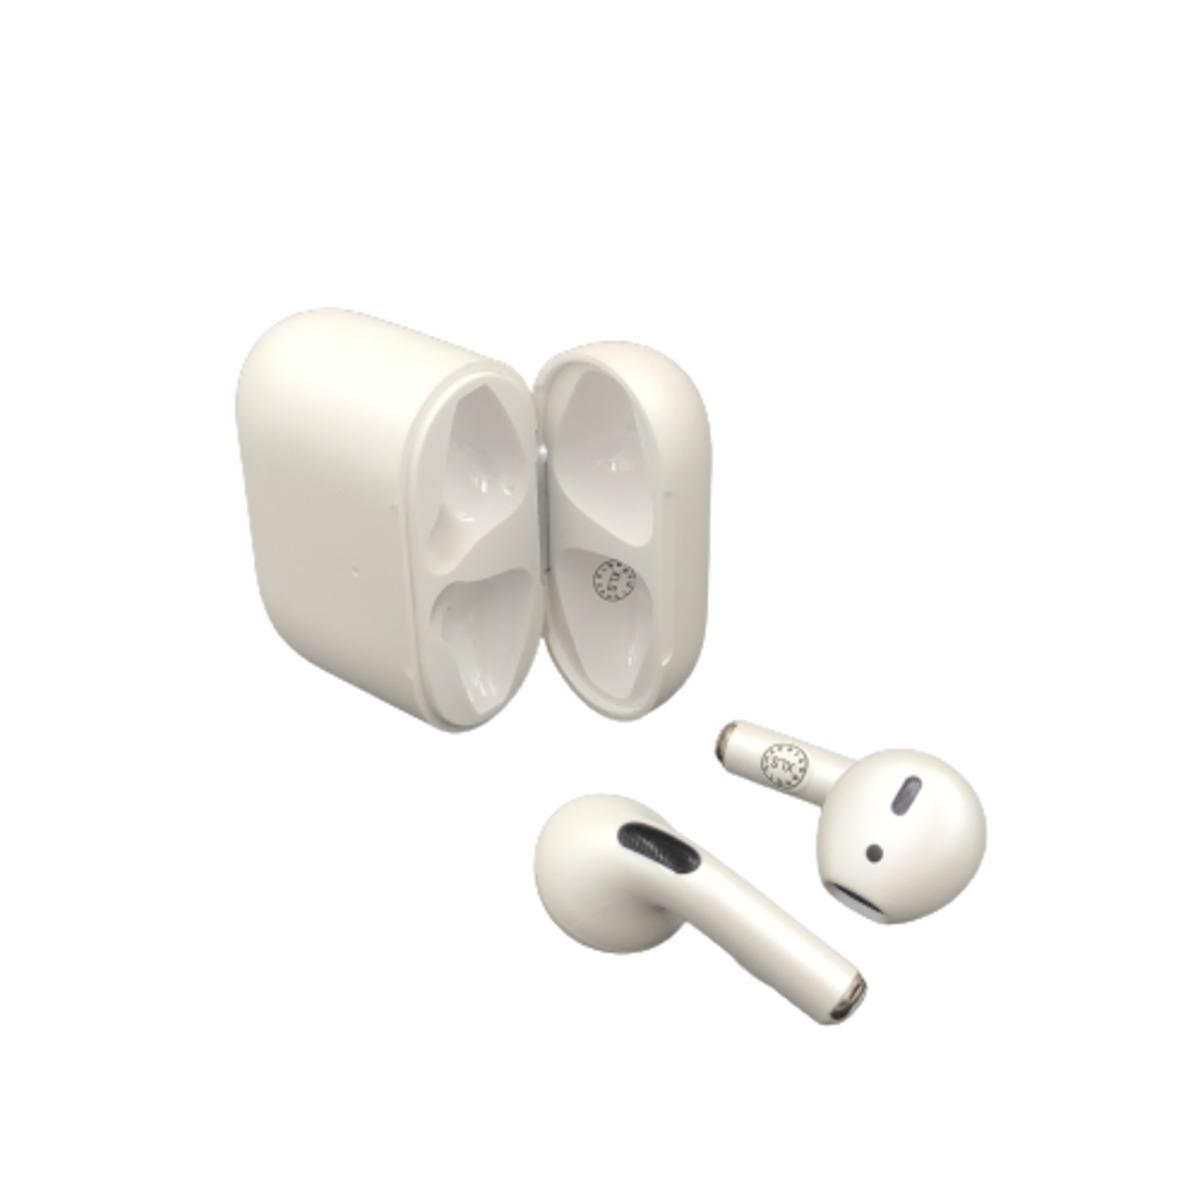 Fone de Ouvido Sem Fio Wireless Bluetooth Branco Pro4 5.0